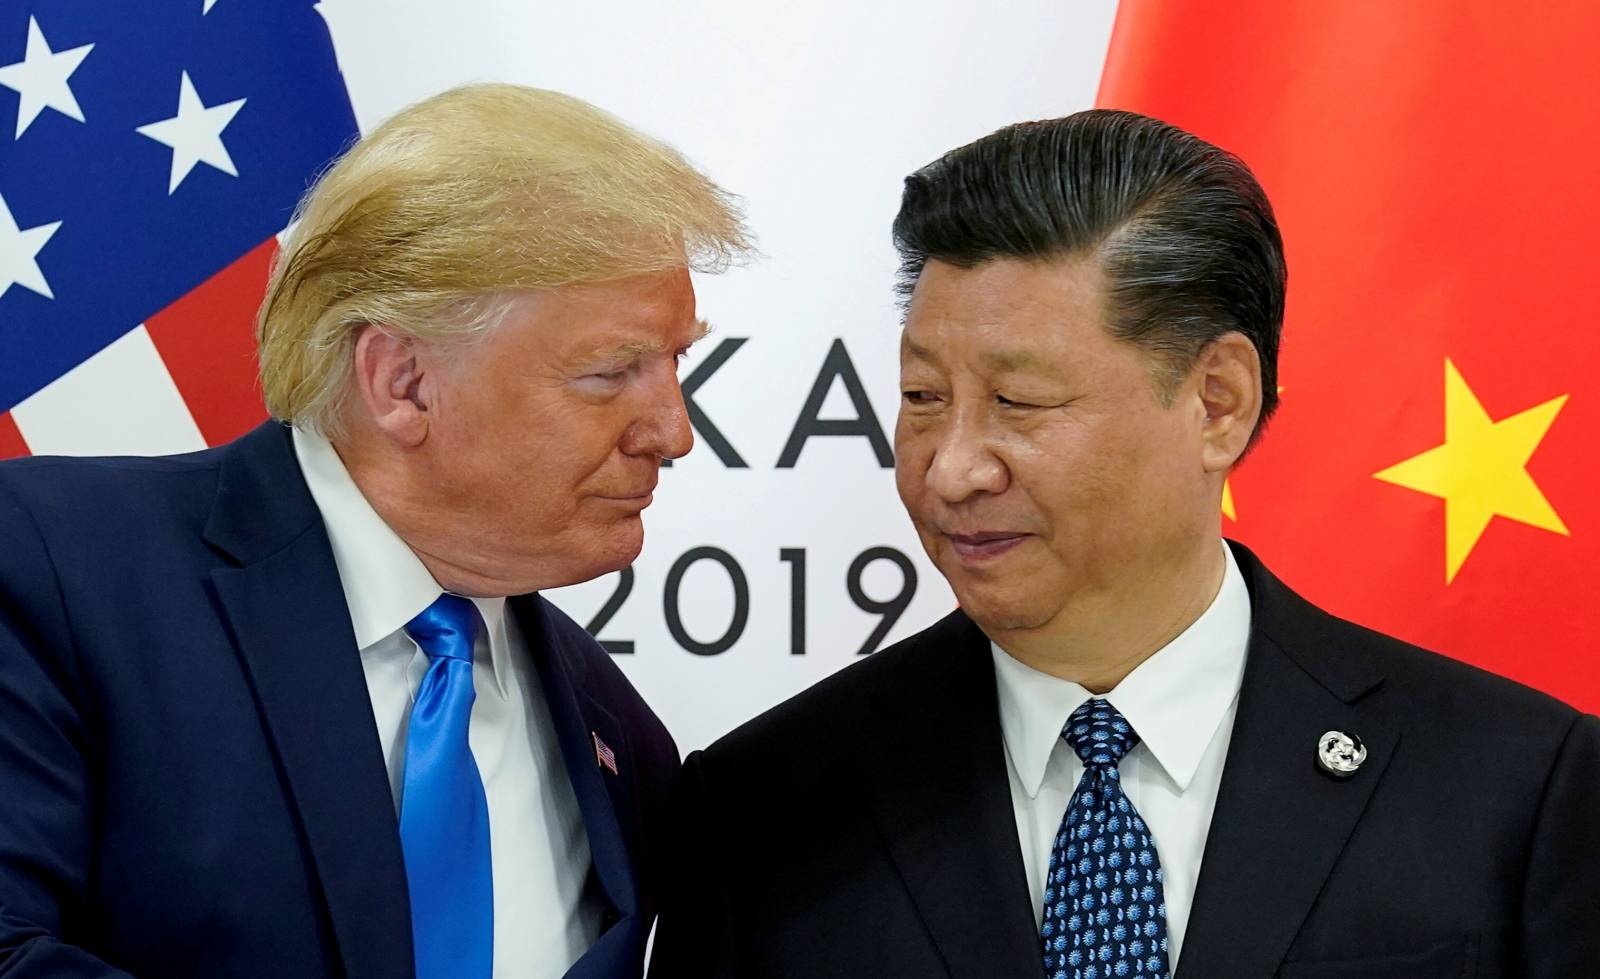 FILE PHOTO: FILE PHOTO: Trump meets Xi at the G20 leaders summit in Osaka, Japan